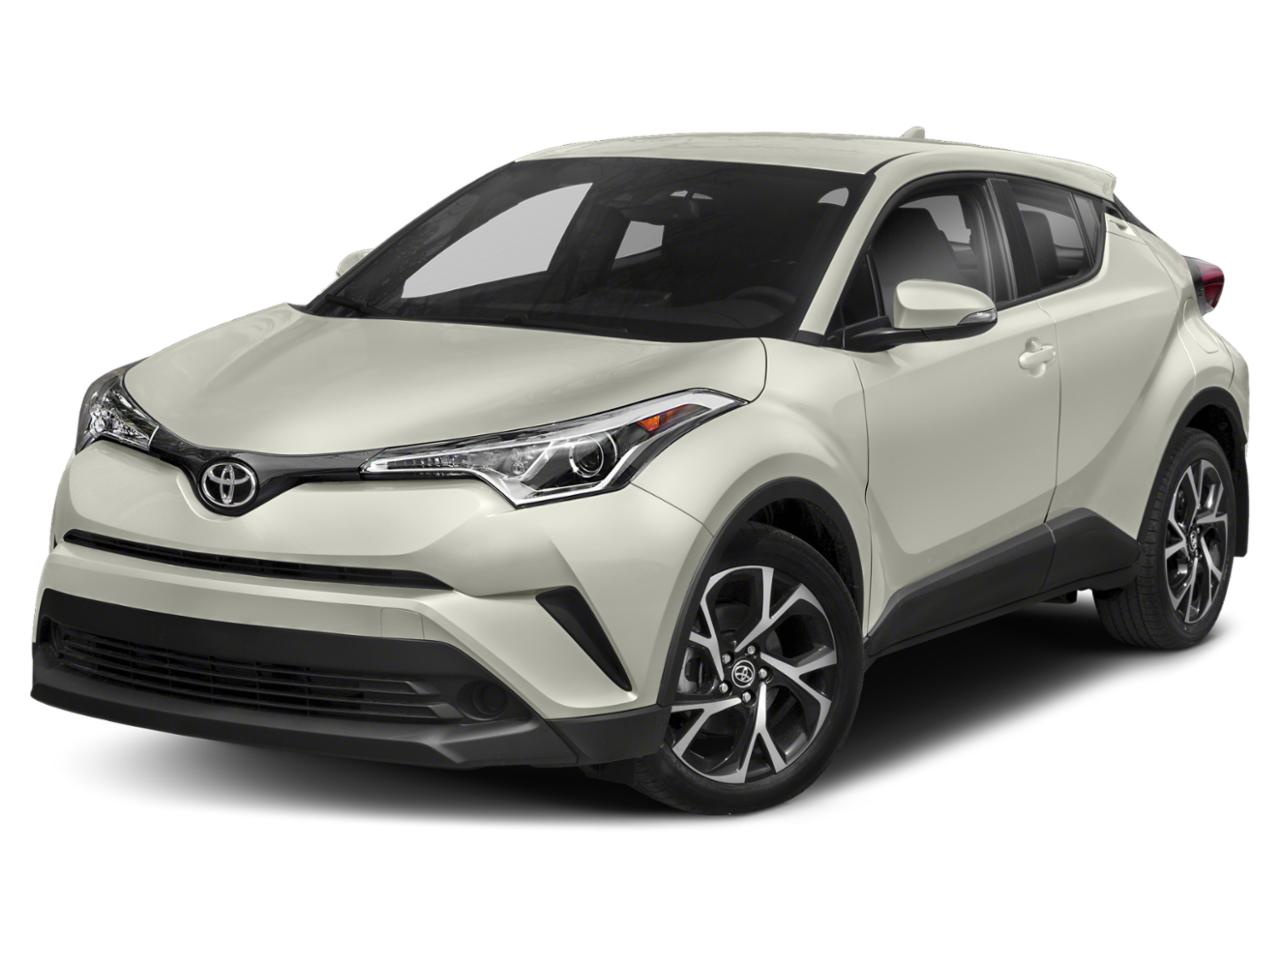 2018 Toyota C-HR Vehicle Photo in Owensboro, KY 42303